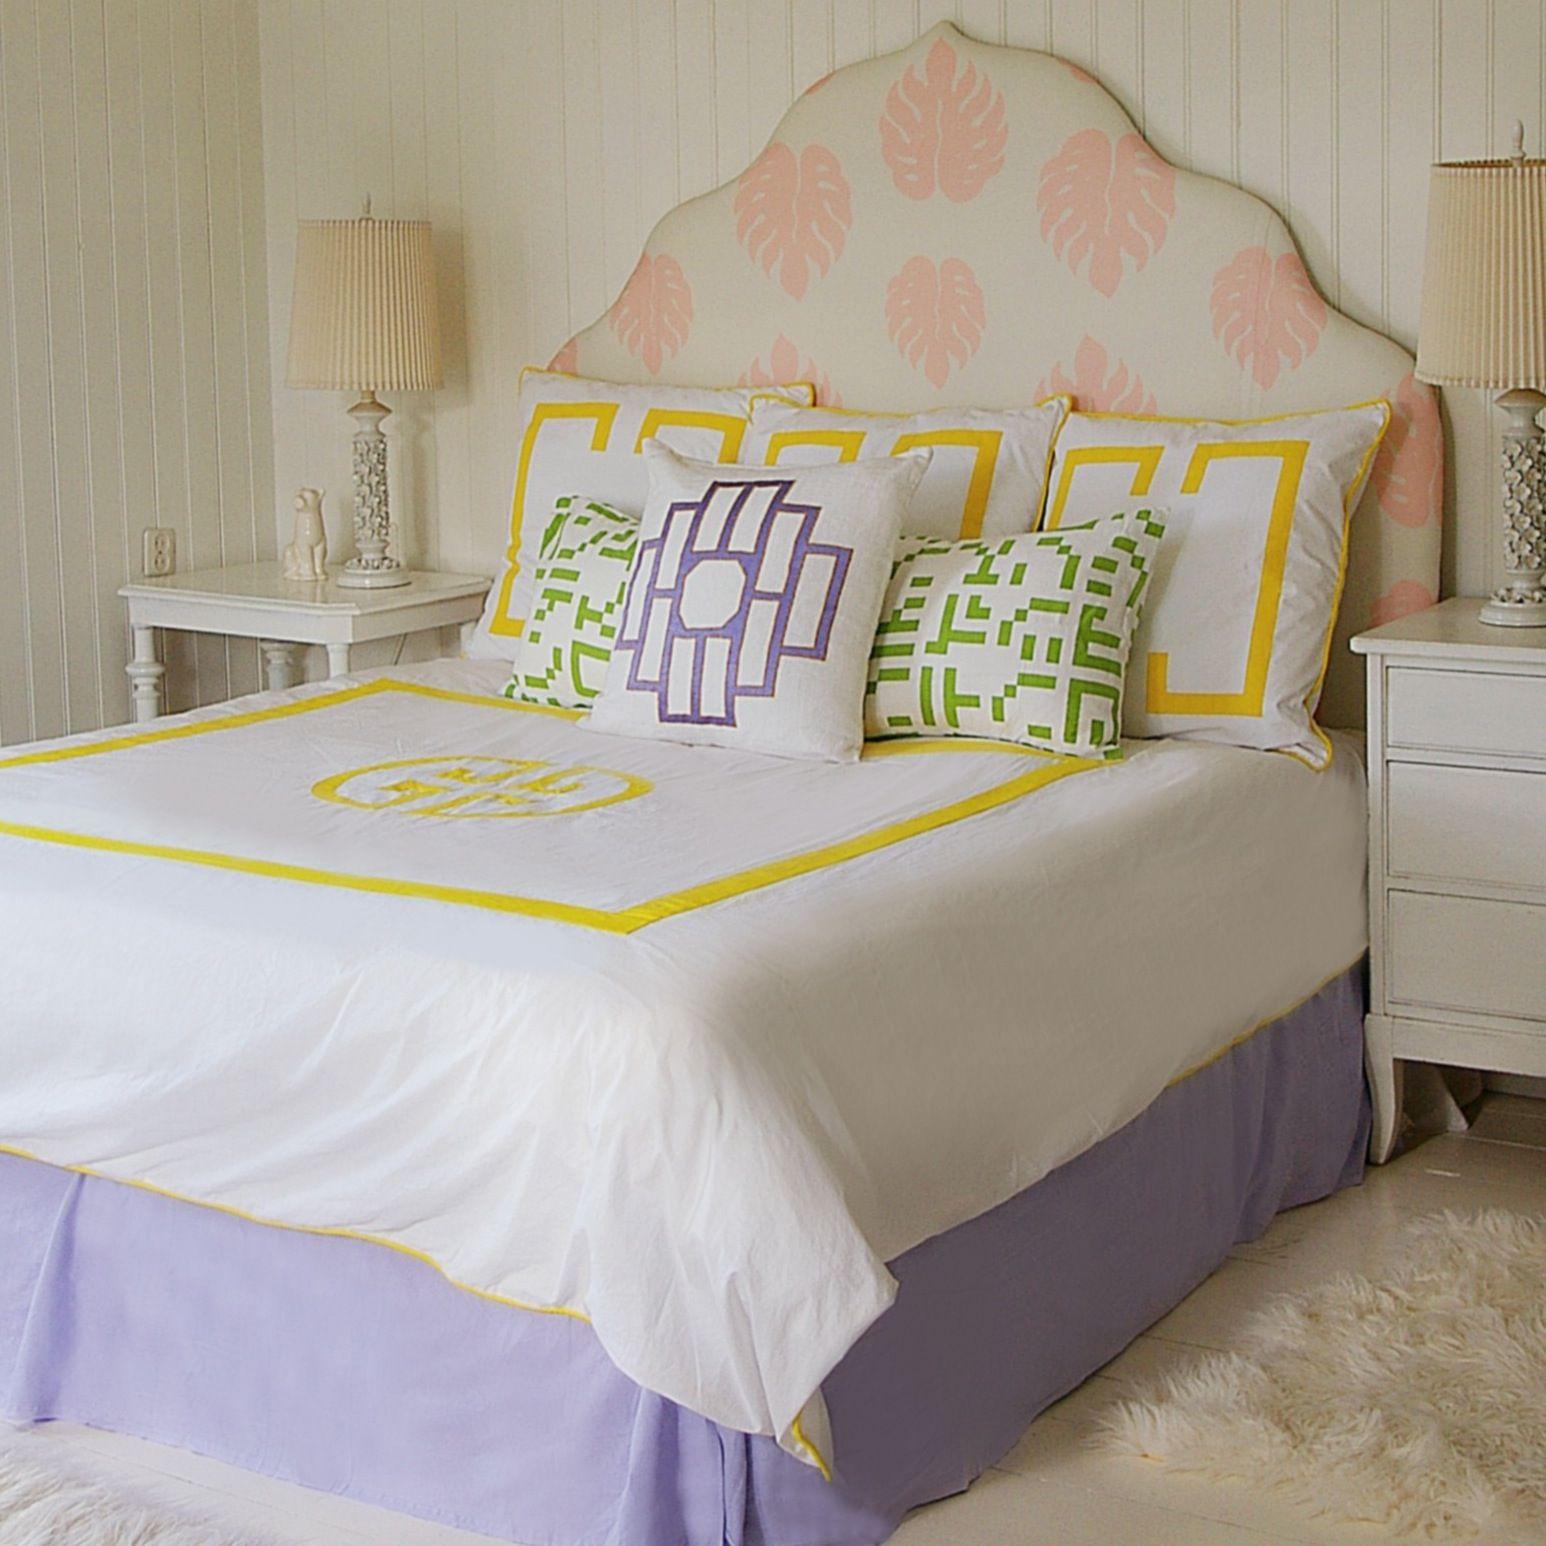 Yellow deco bedding from jill sorensen lifestyle